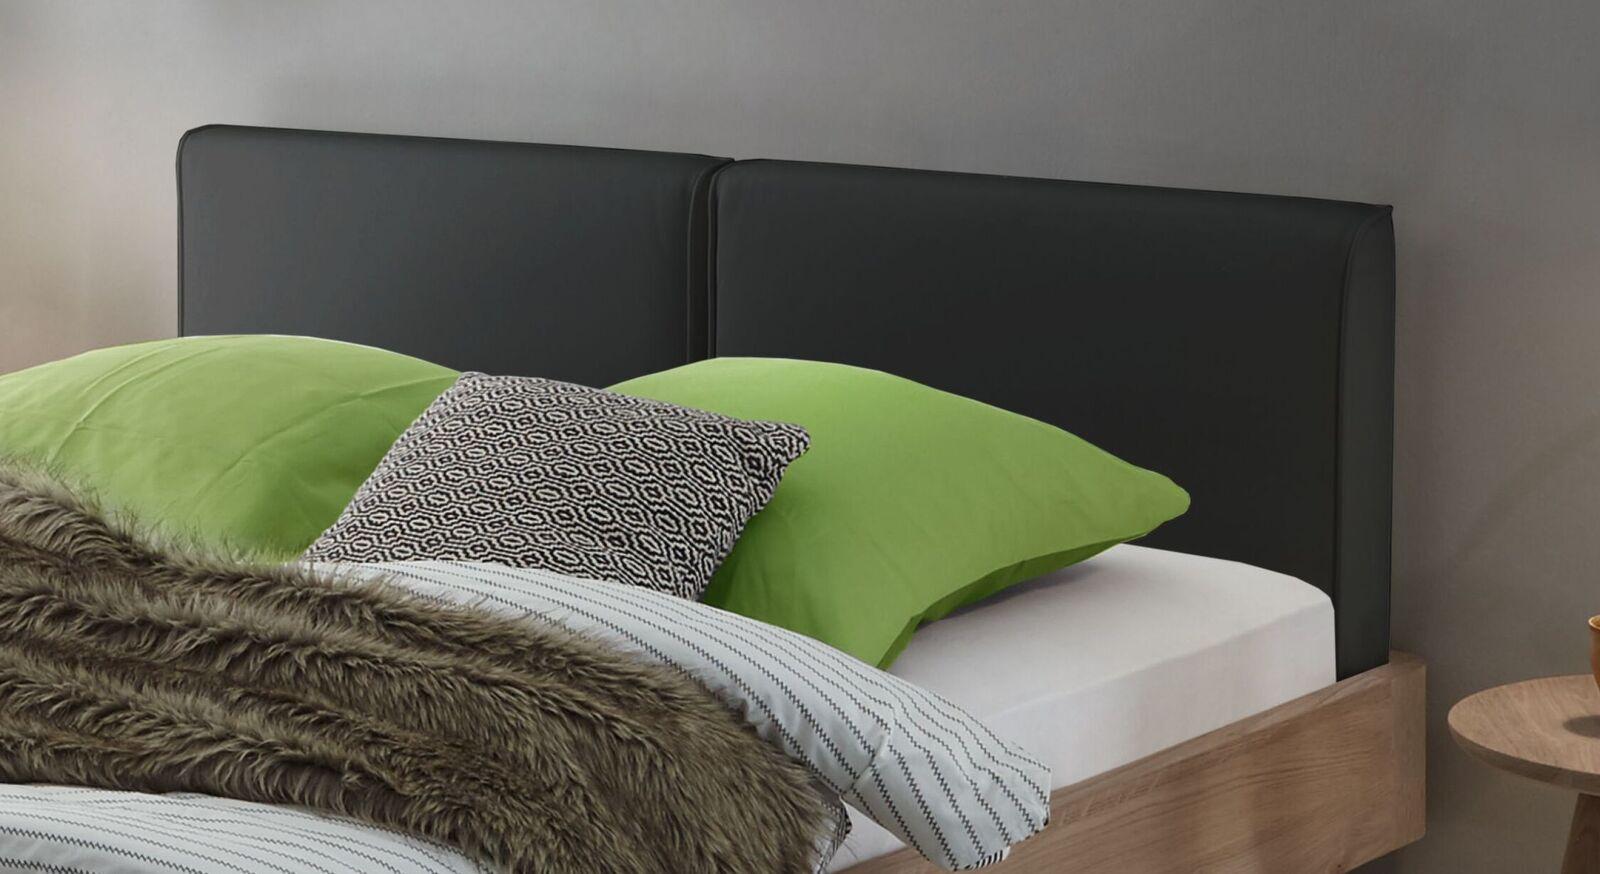 Modernes Bett Inesis mit gepolstertem Kopfteil